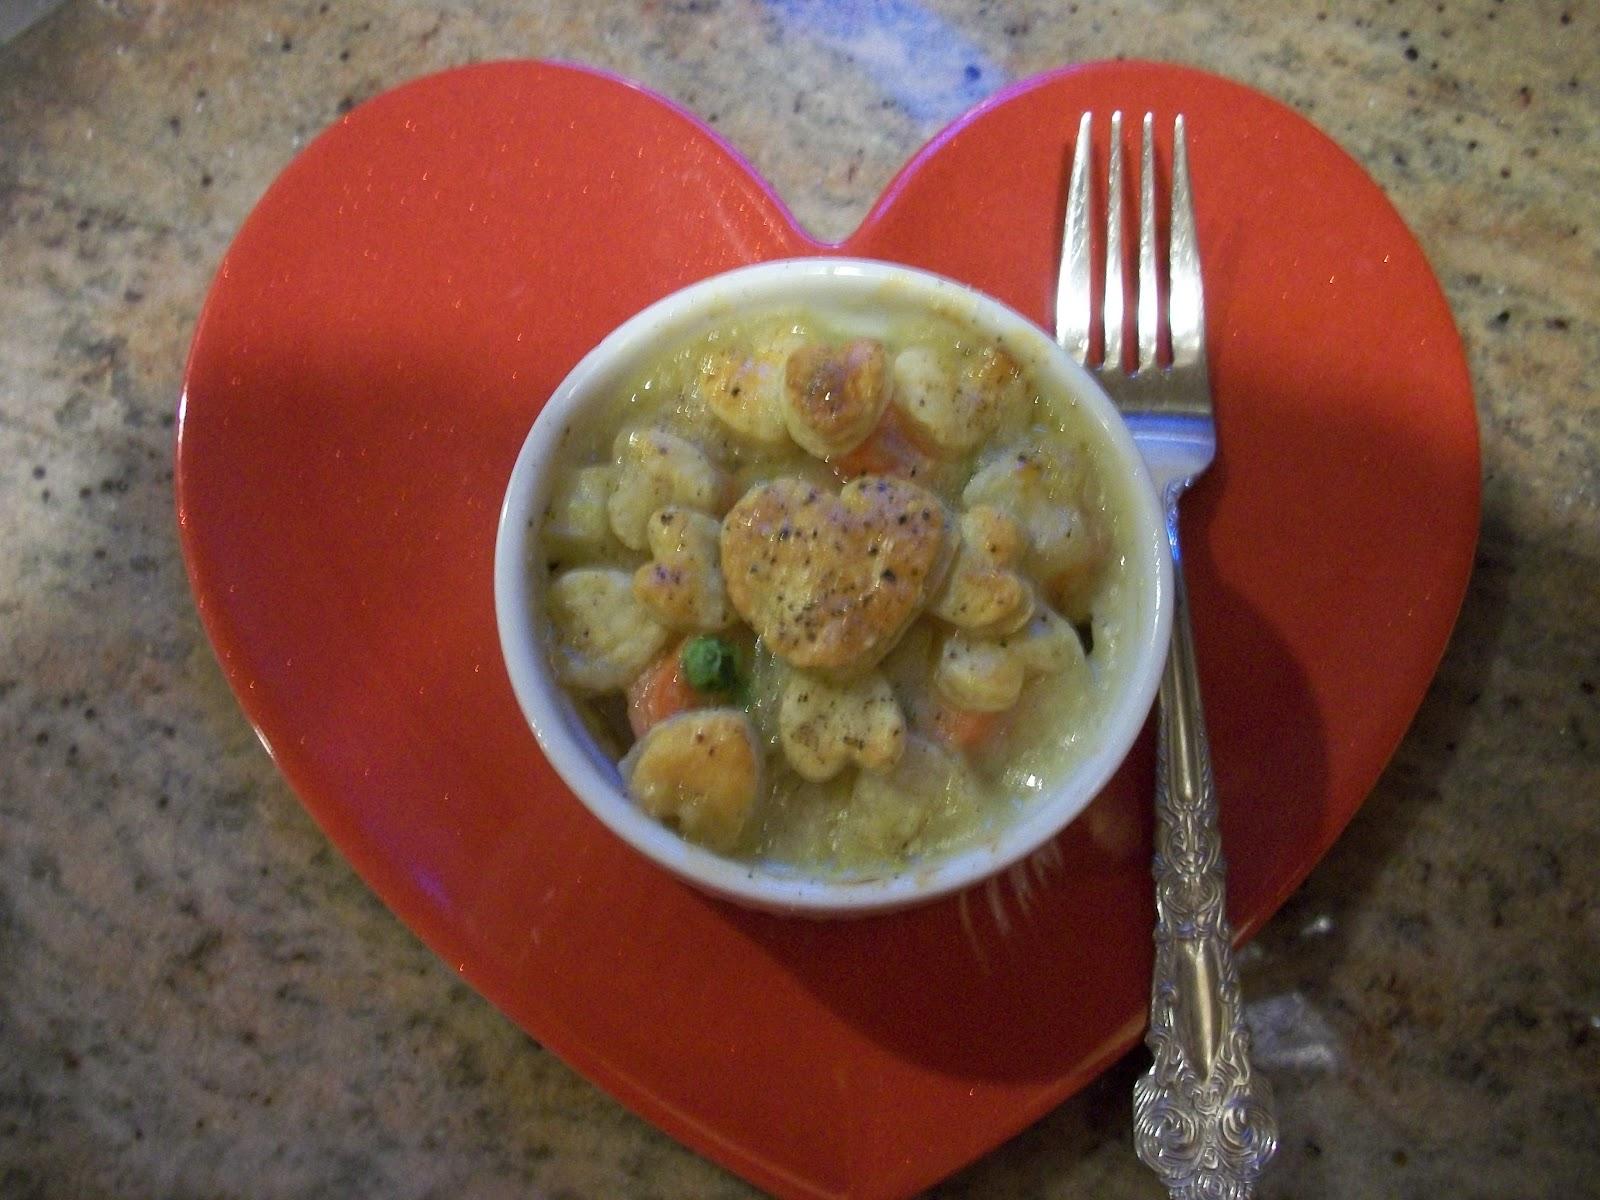 Parnell's Pantry: Veggie Pot Pie